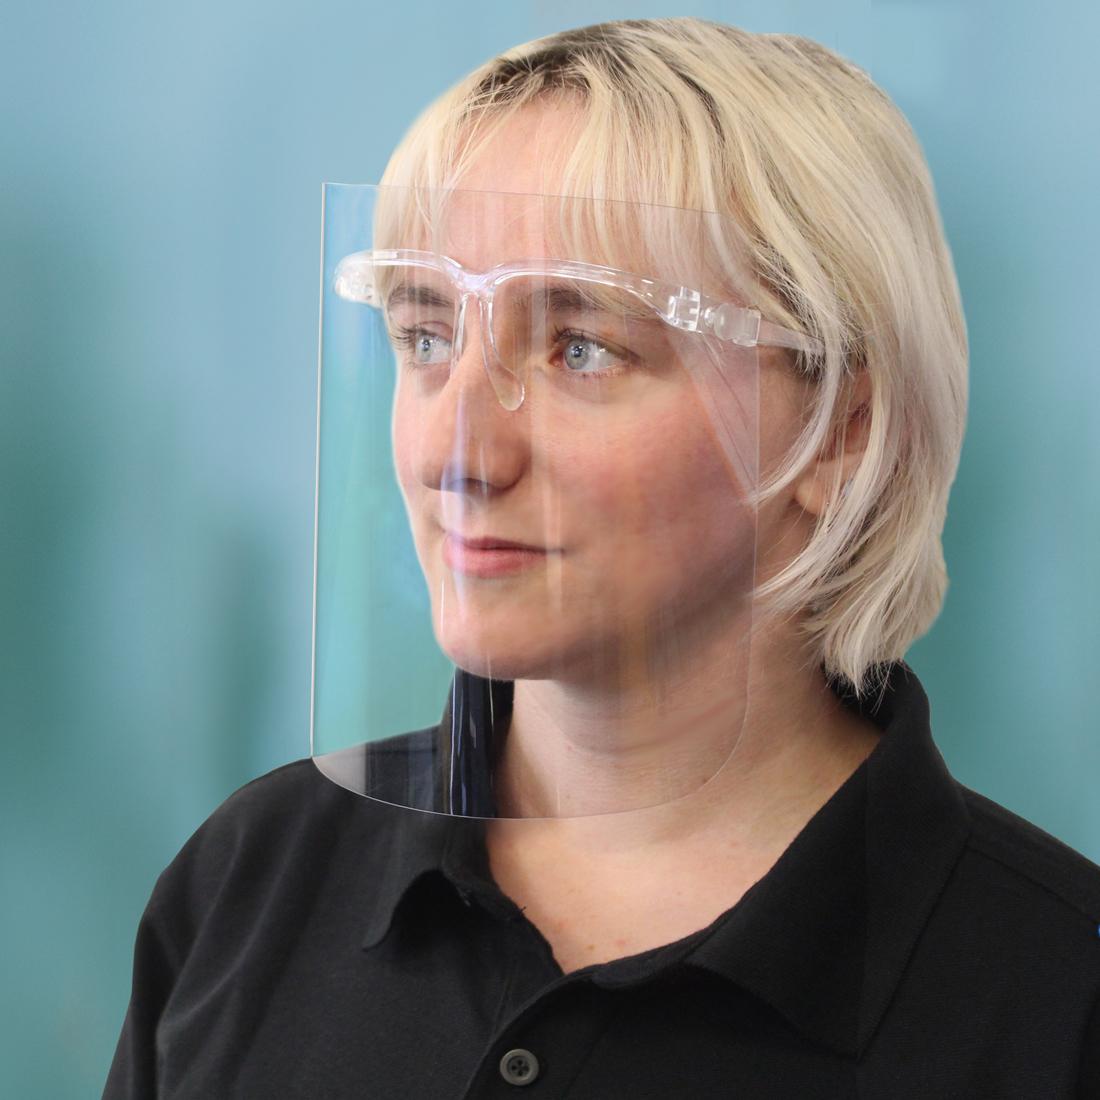 Portwest Base 250 Micron APET Face Shield Glasses (100)